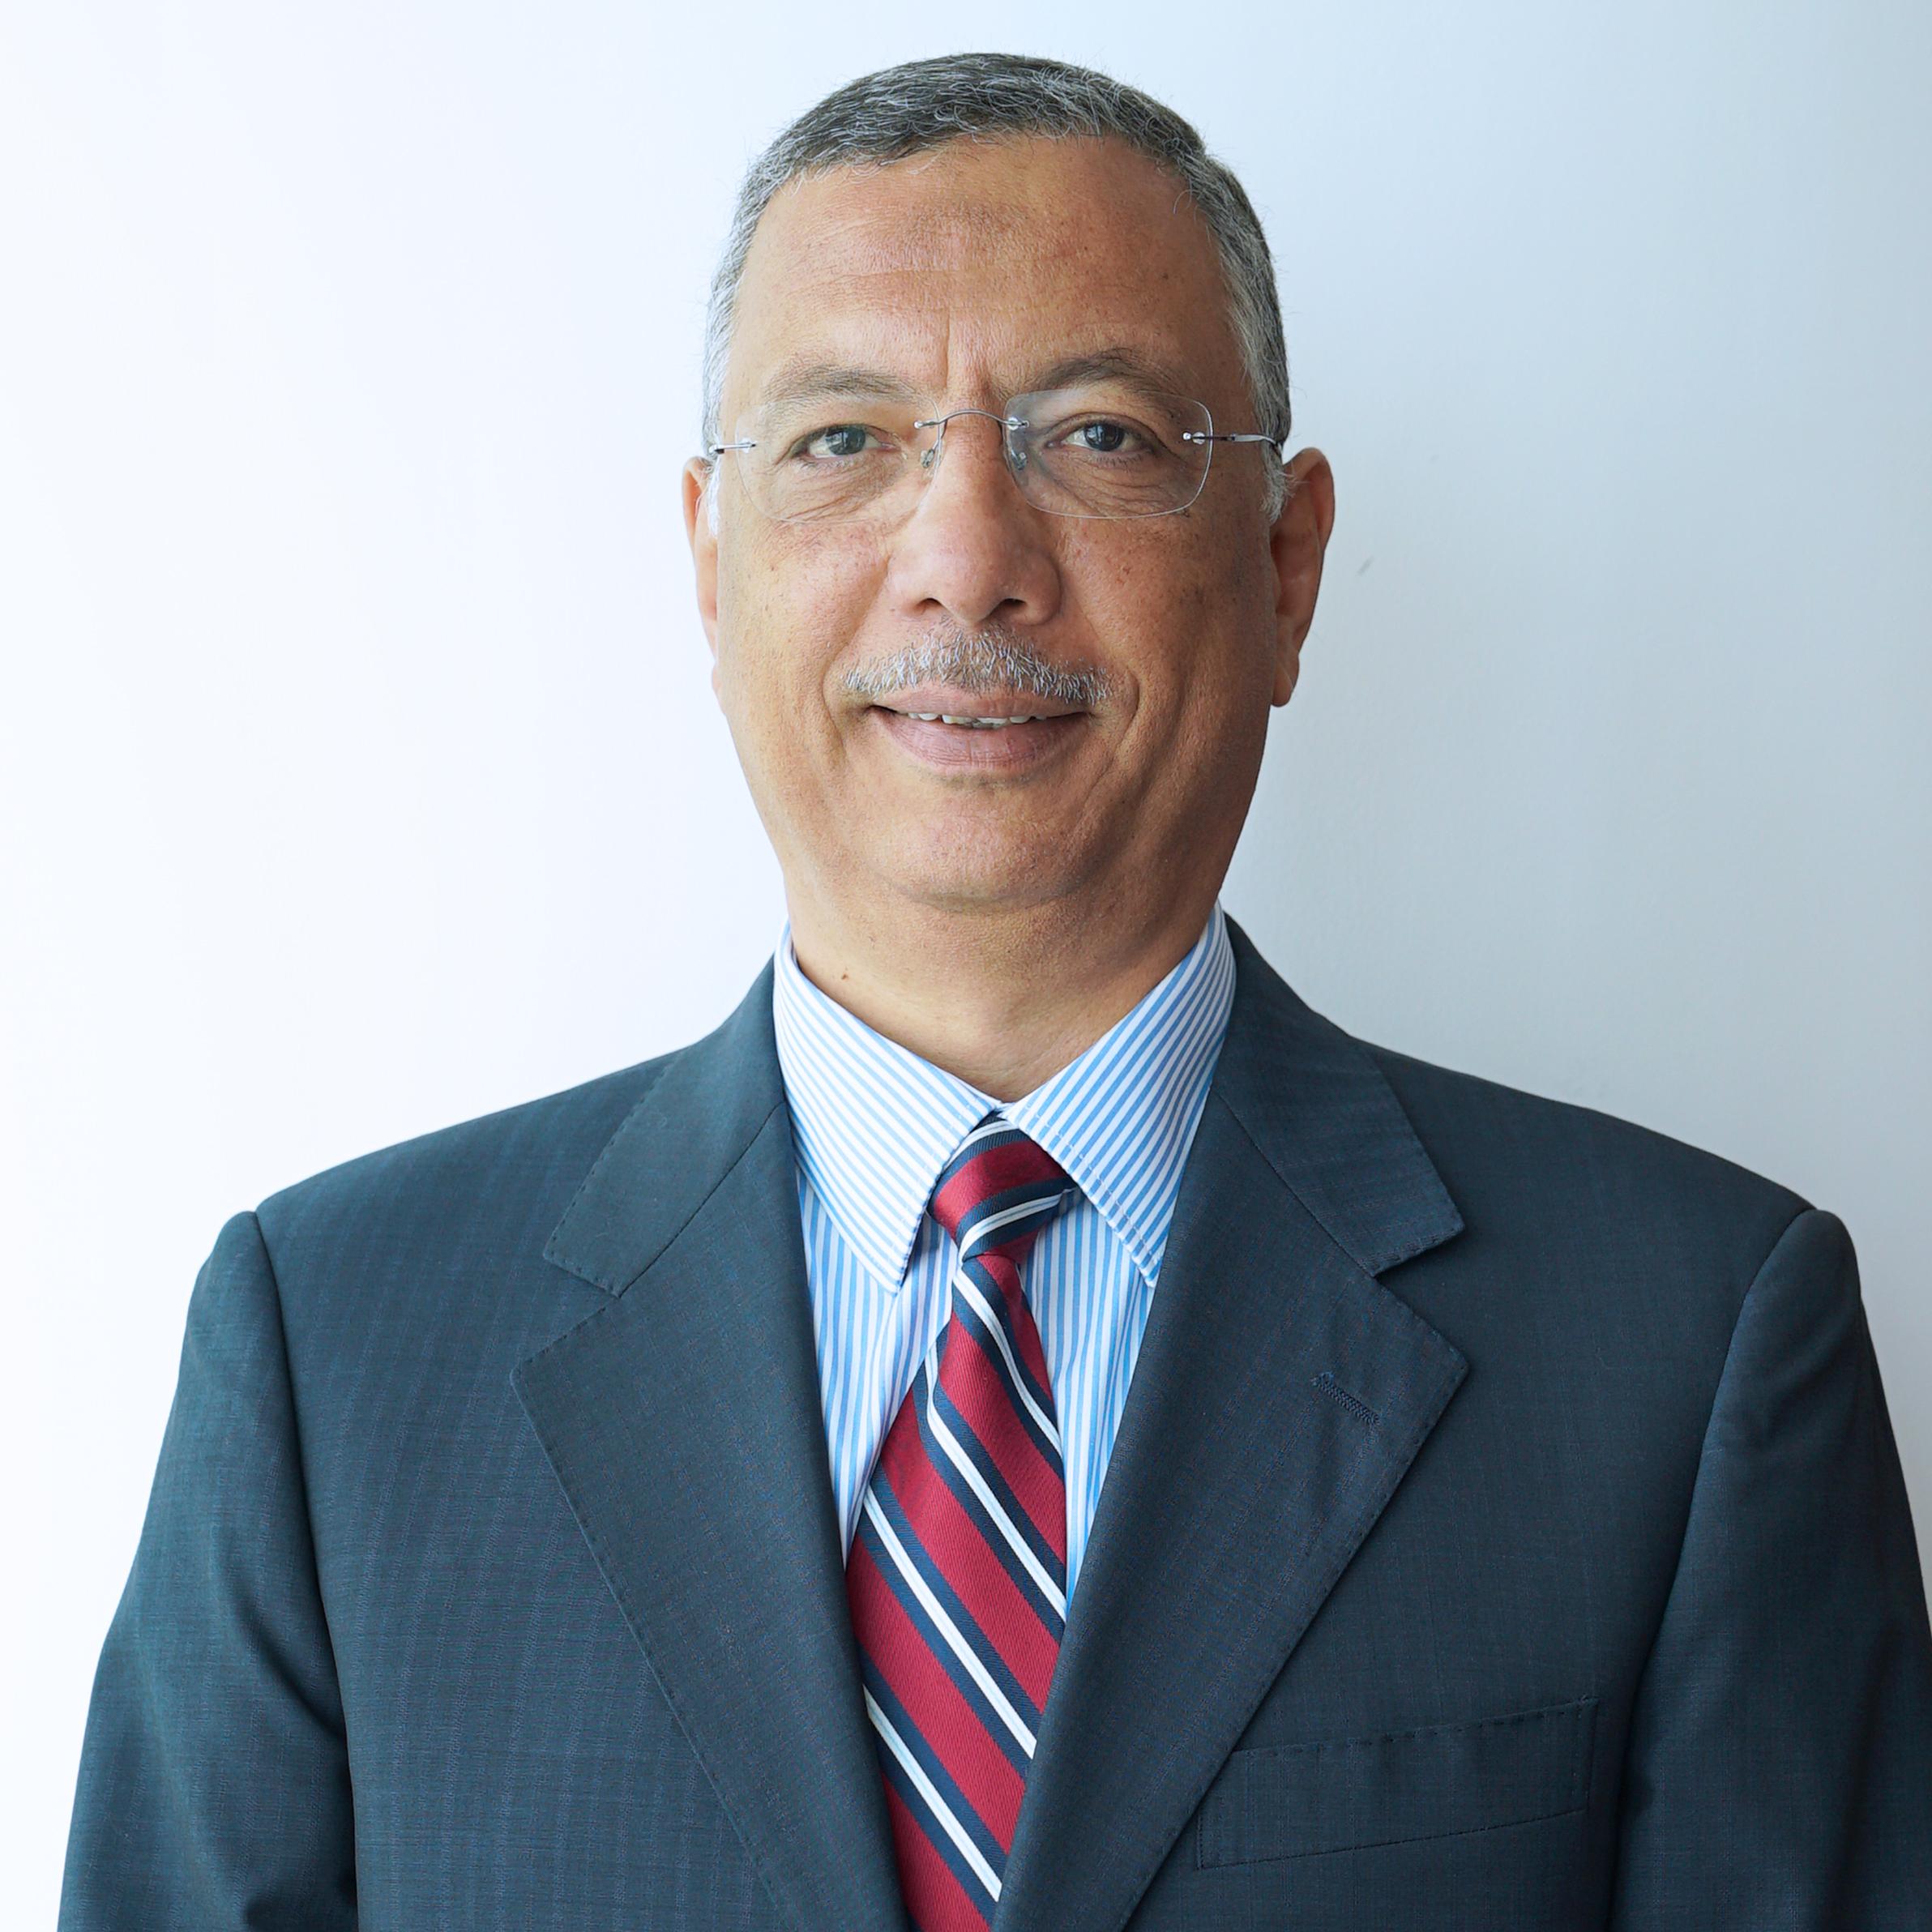 #8 Hamed Zaghw, CEO of AECOM